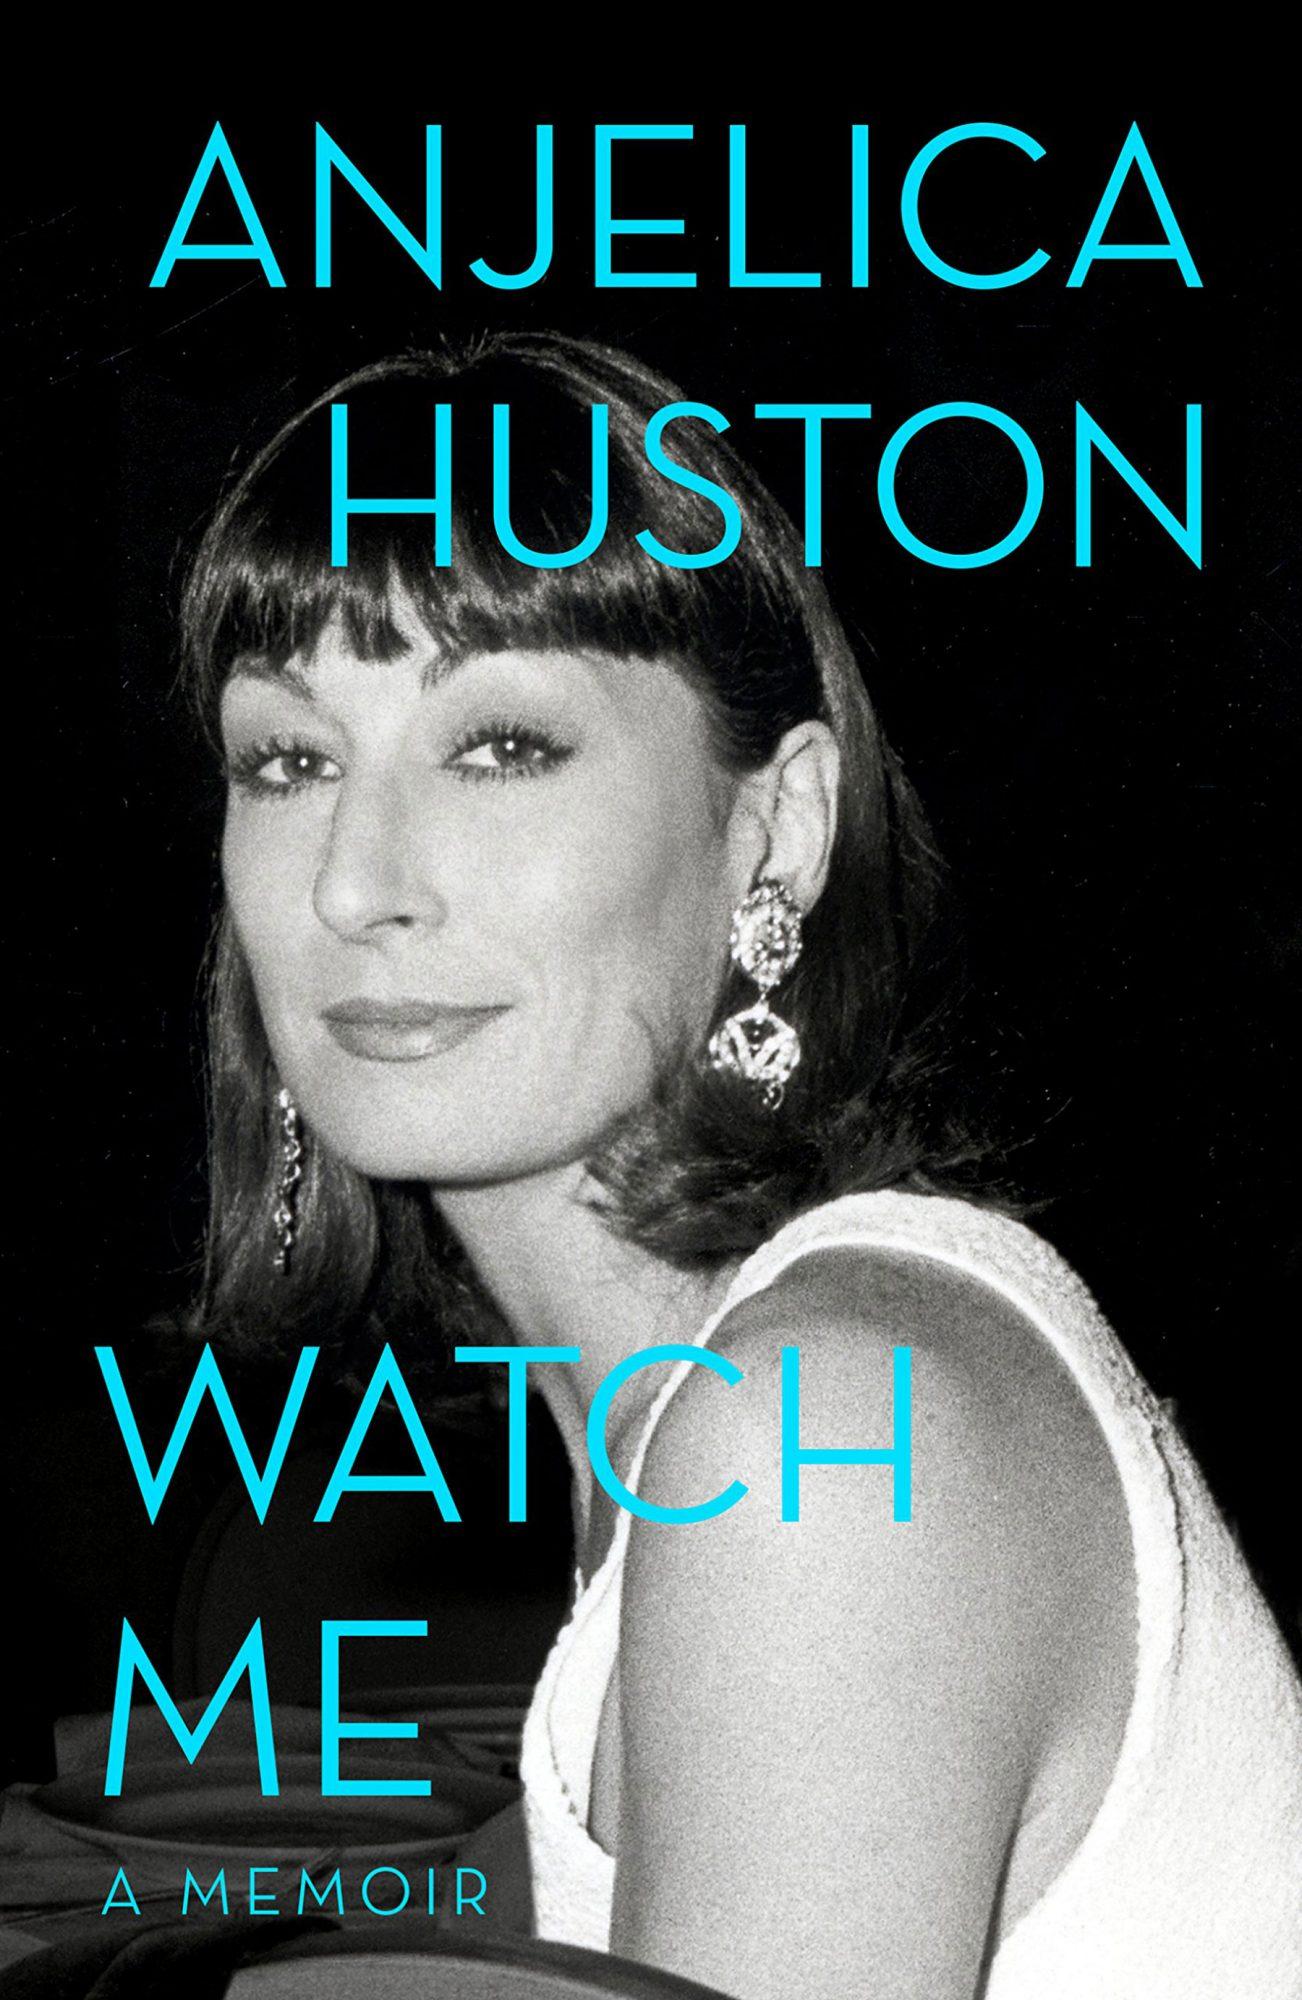 Anjelica-Huston